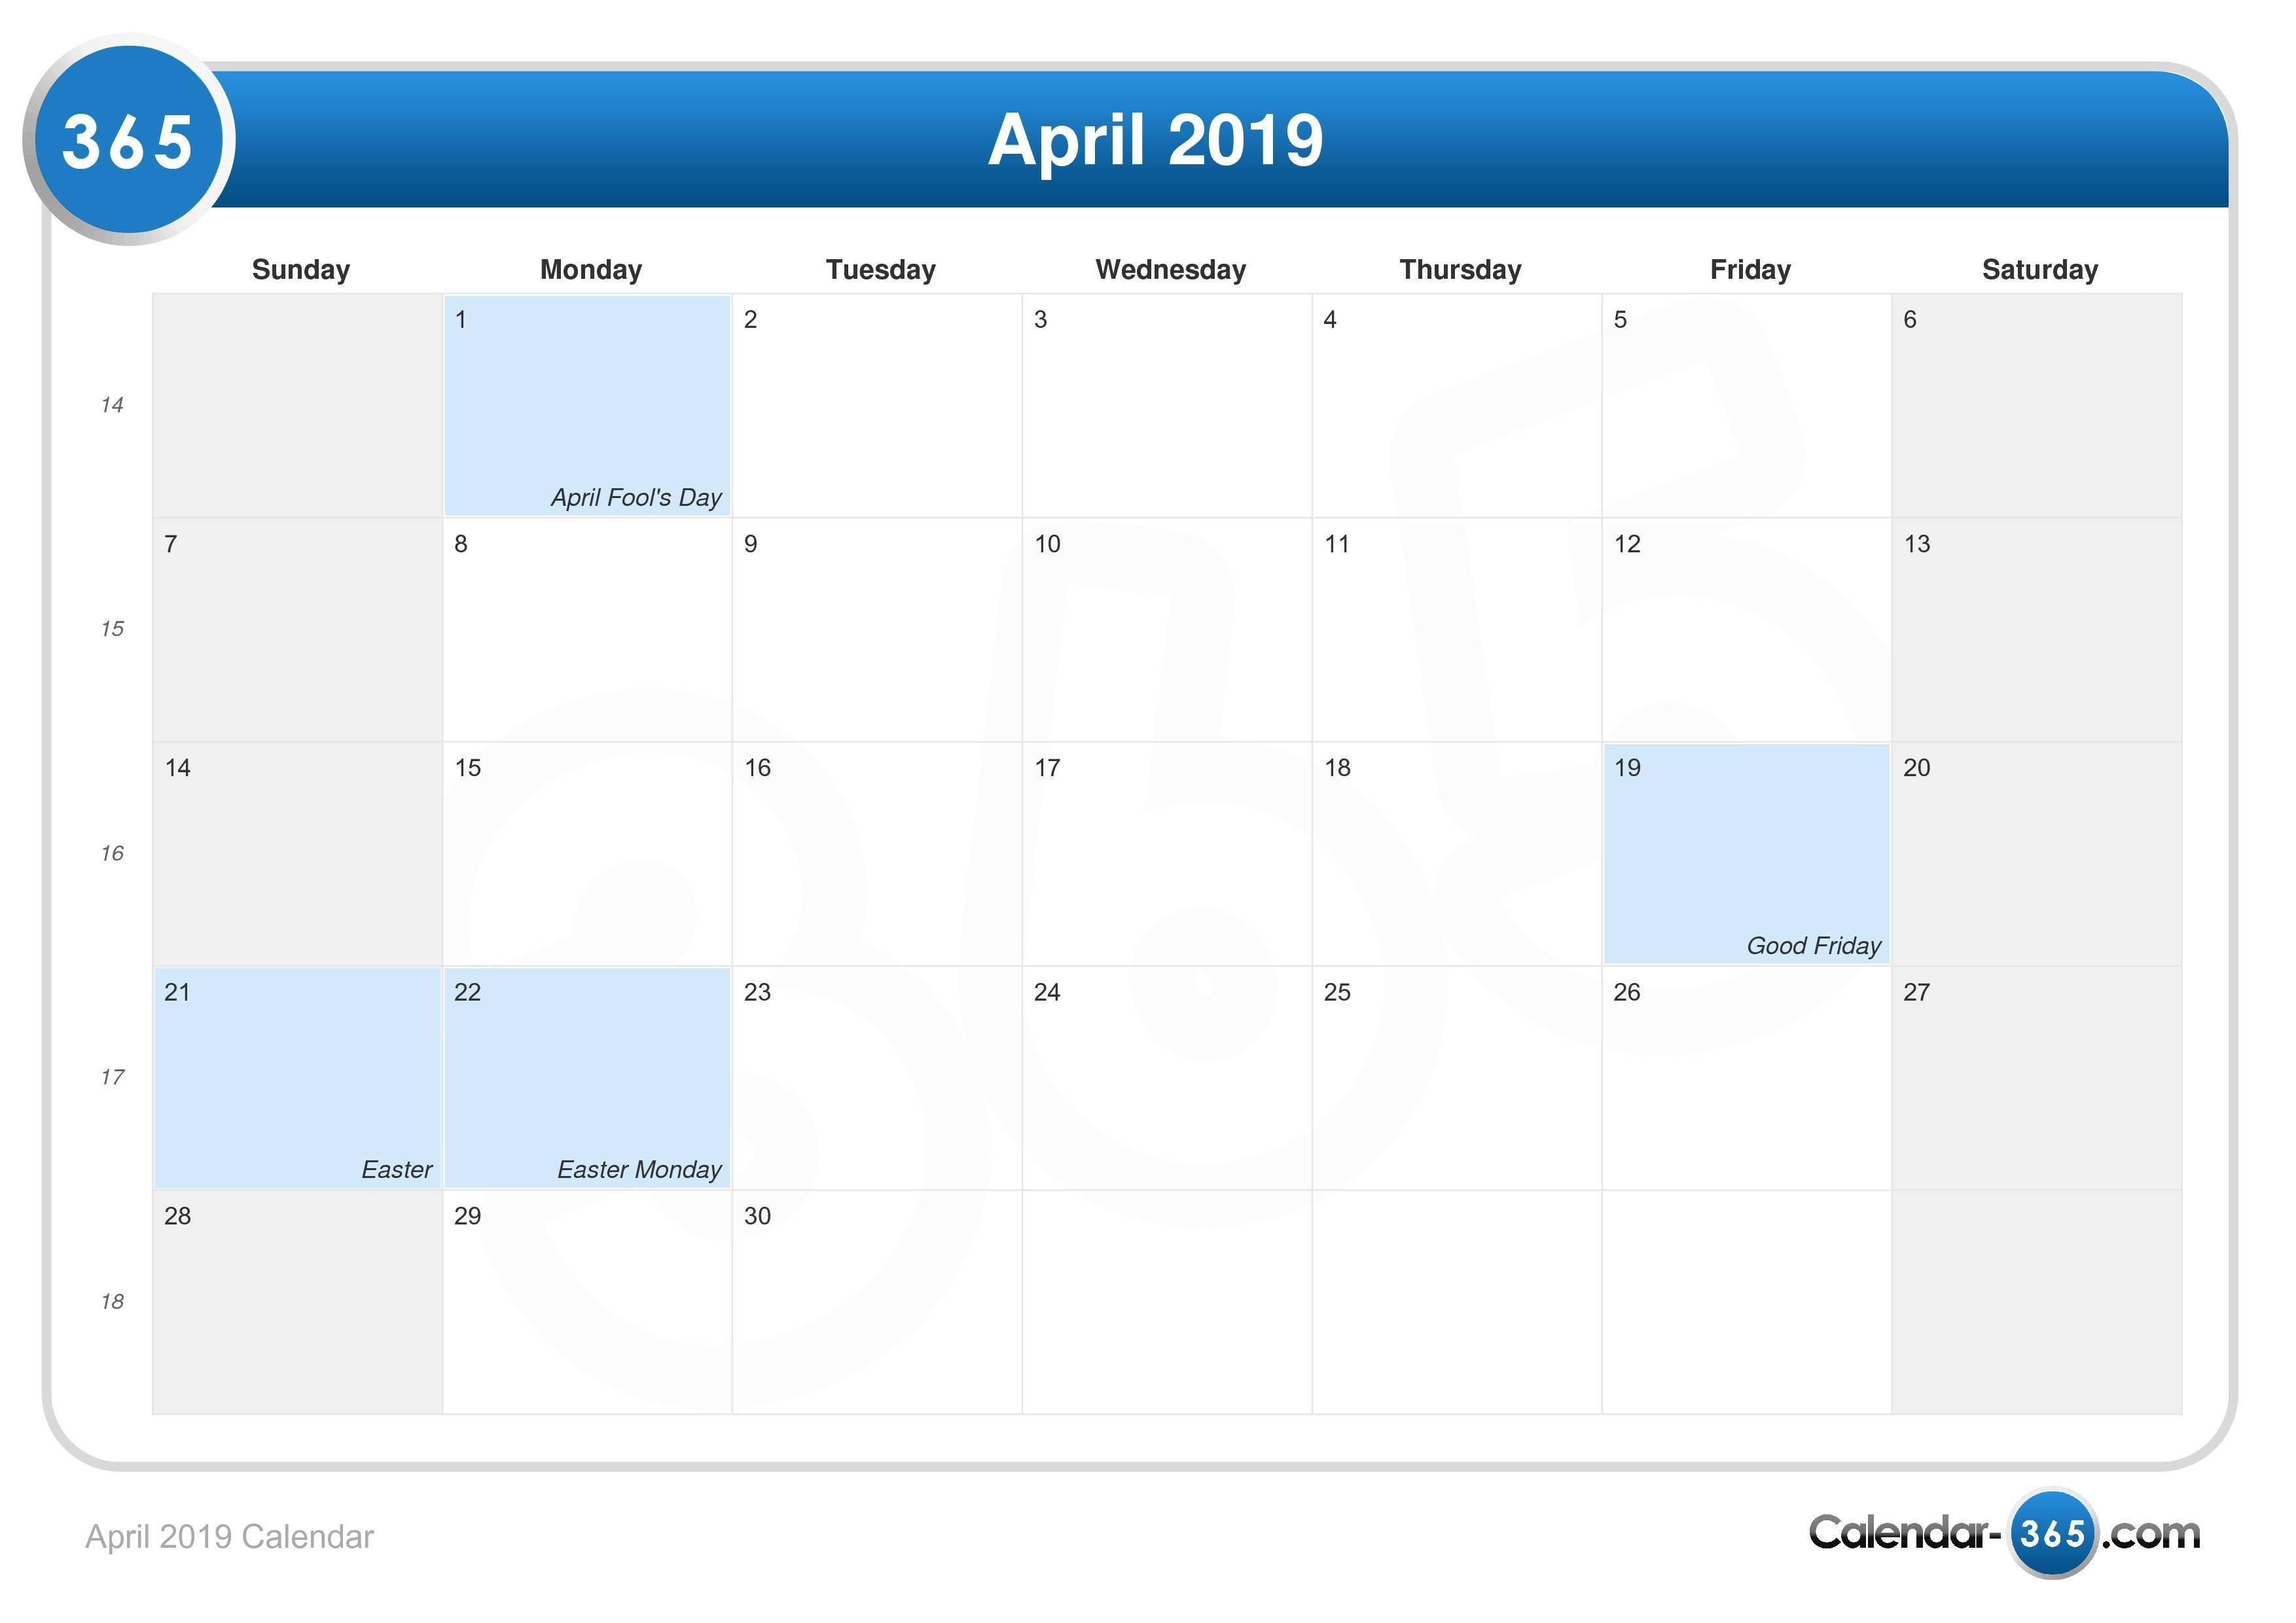 April 2019 Calendar April 6 2019 Calendar